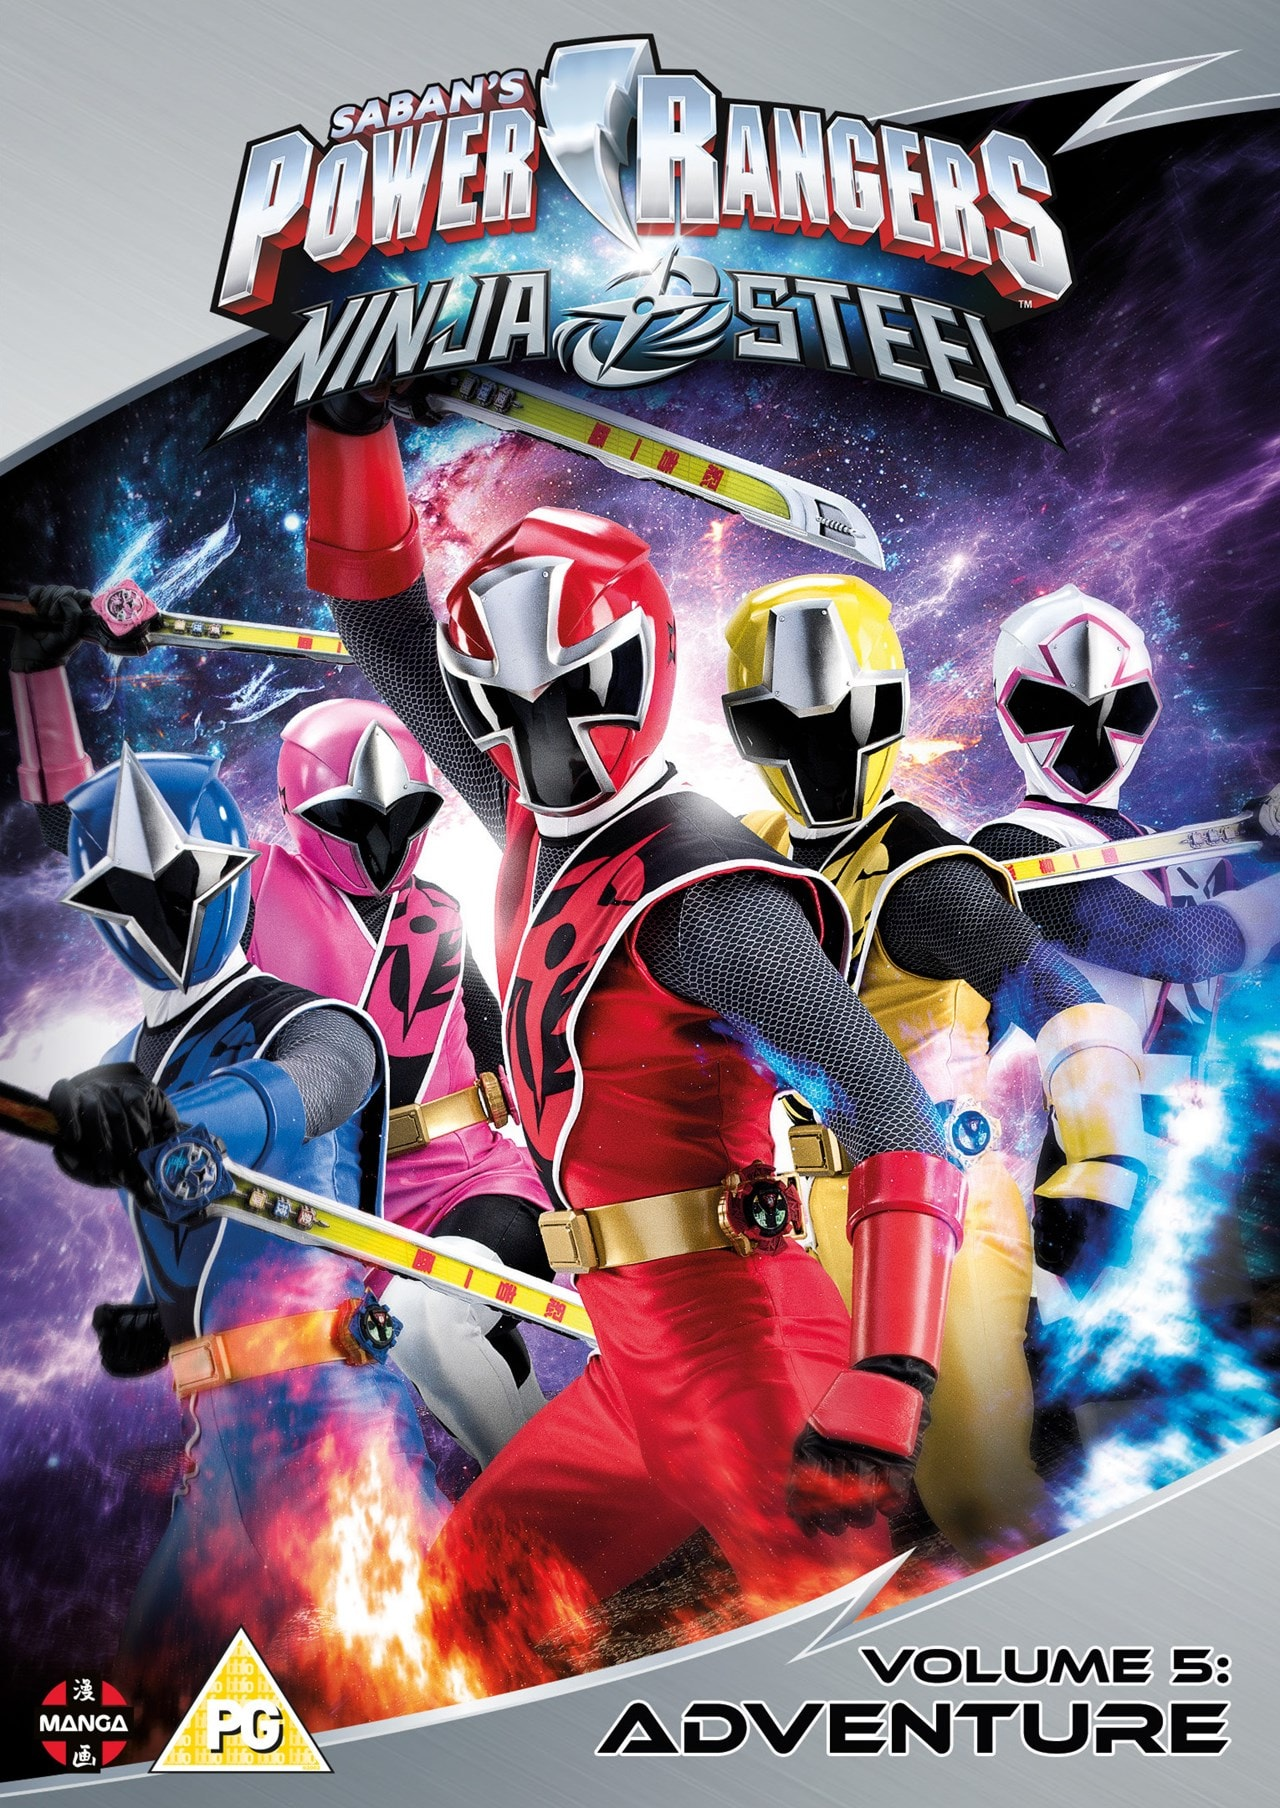 Power Rangers Ninja Steel: Volume 5 - Adventure - 1